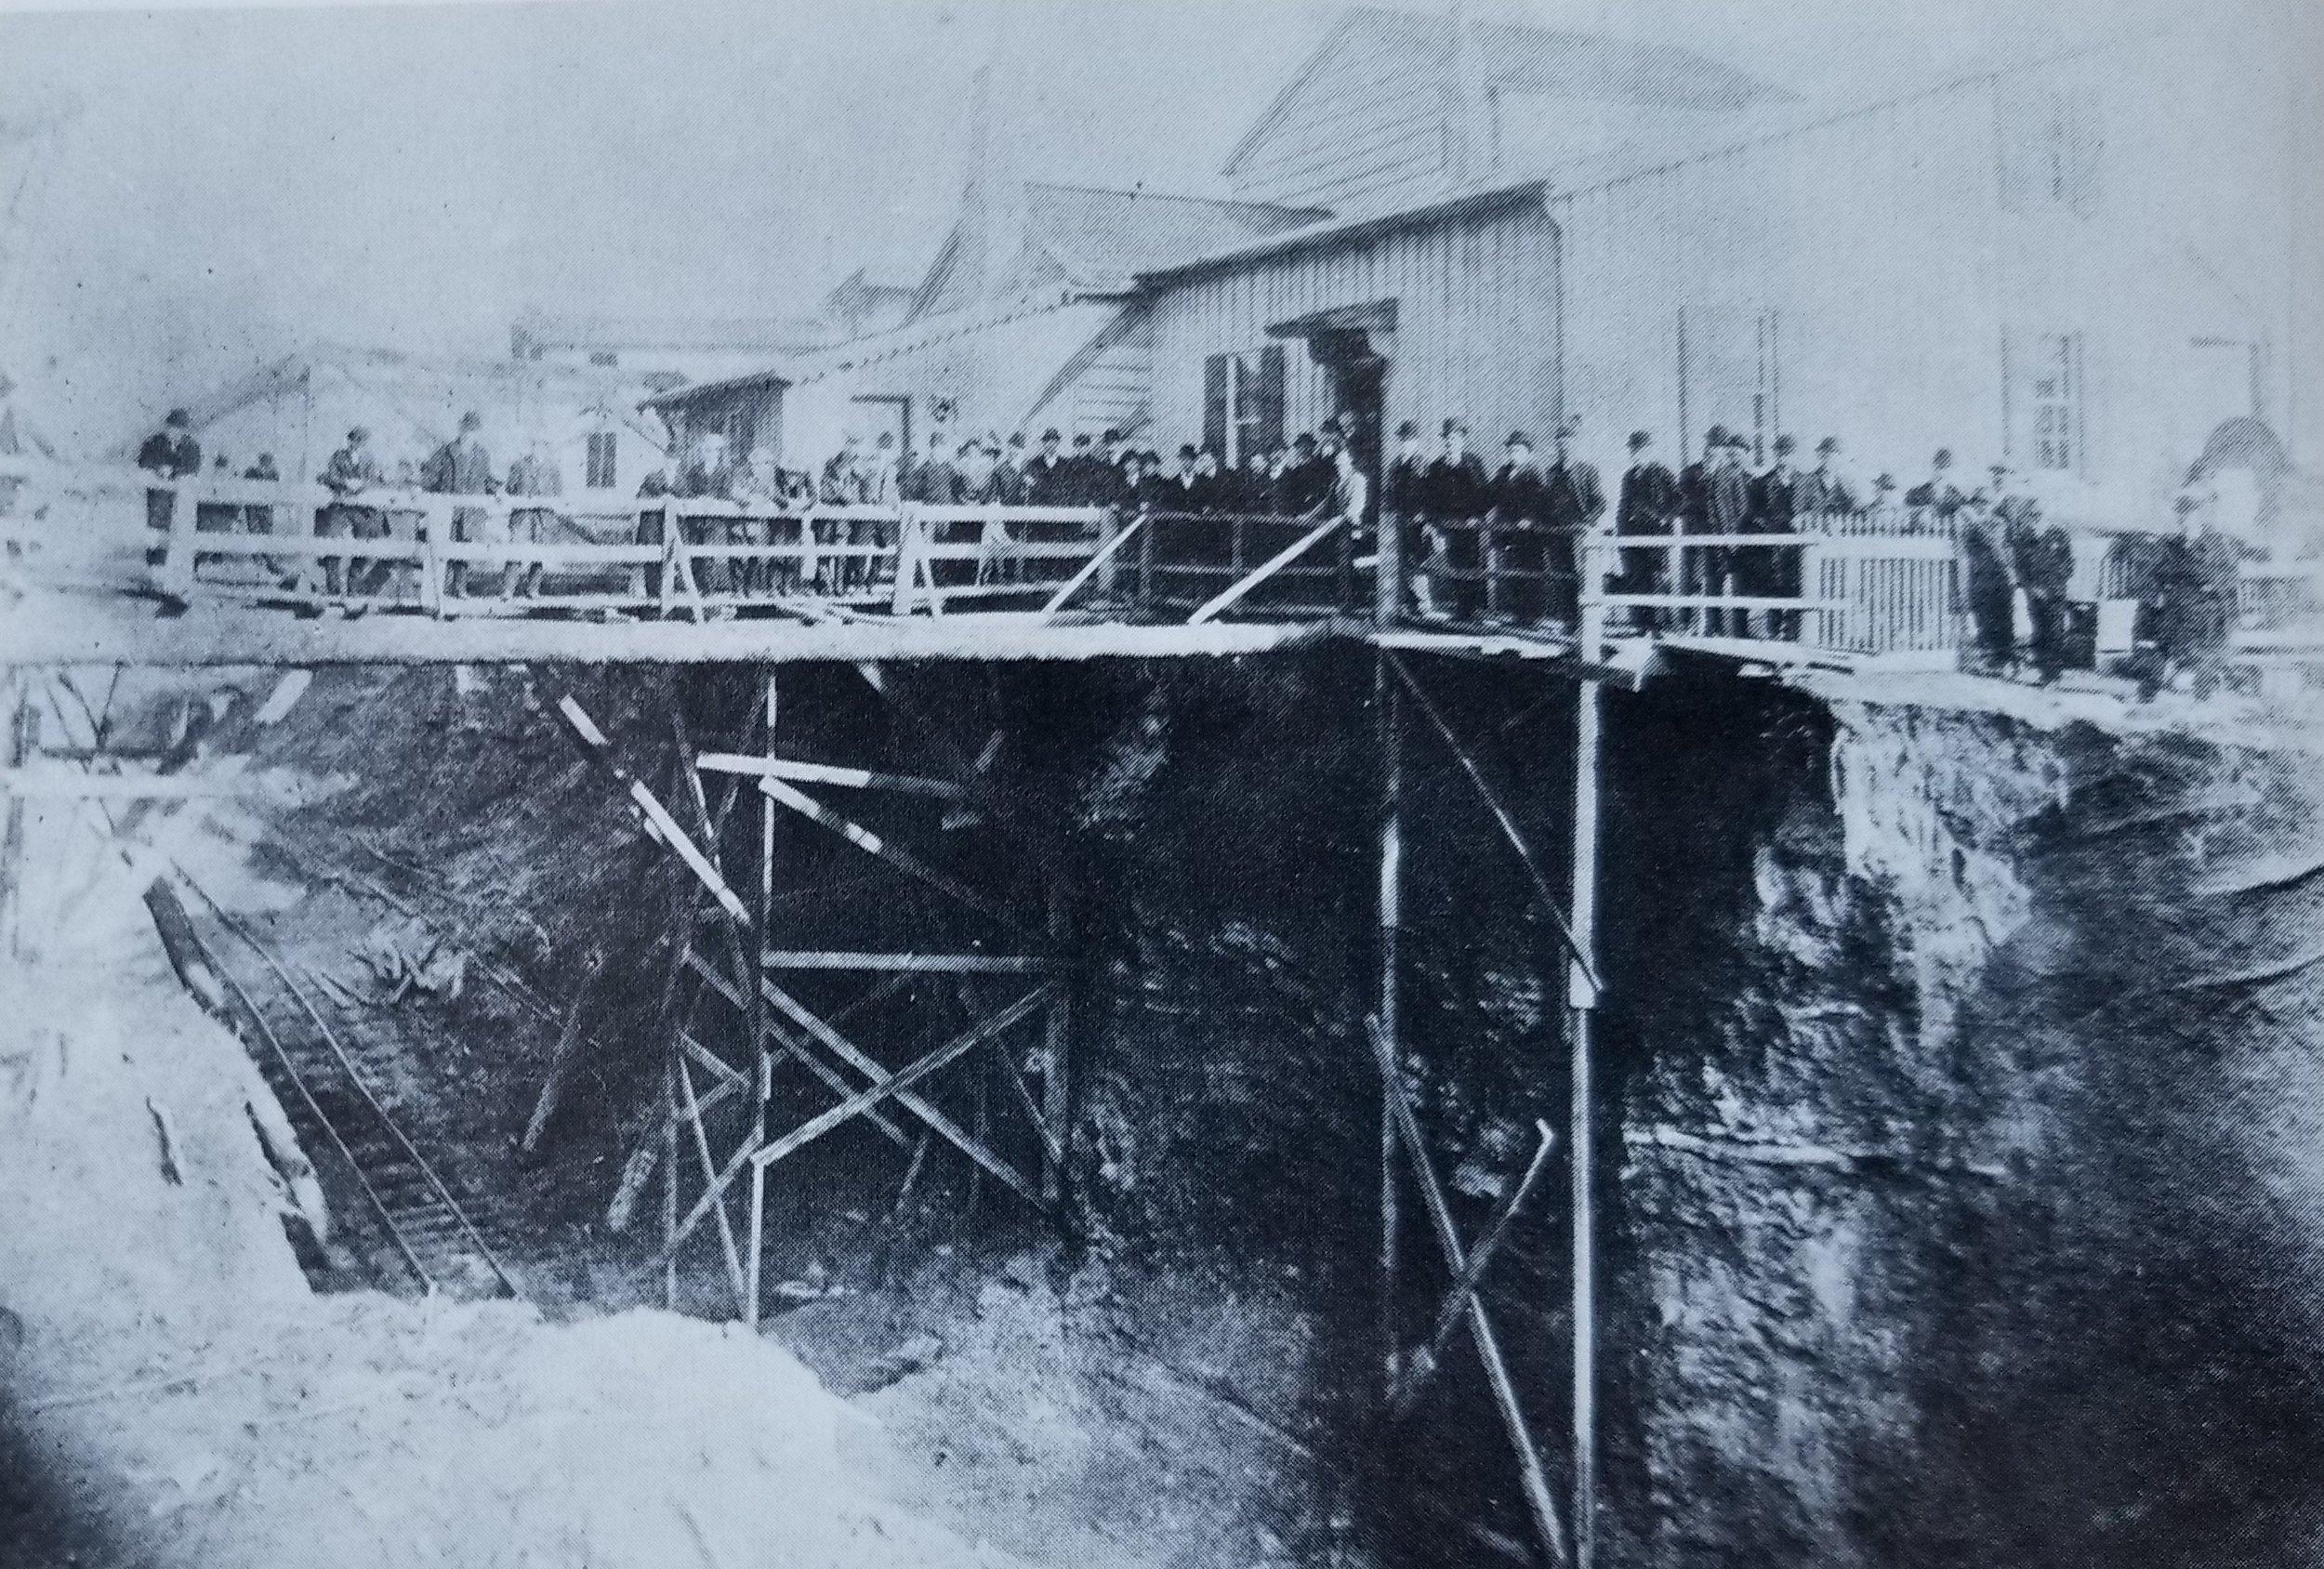 Construction of the Westport Tunnels. Date: 1906. Source: John E. Merriken Collection.